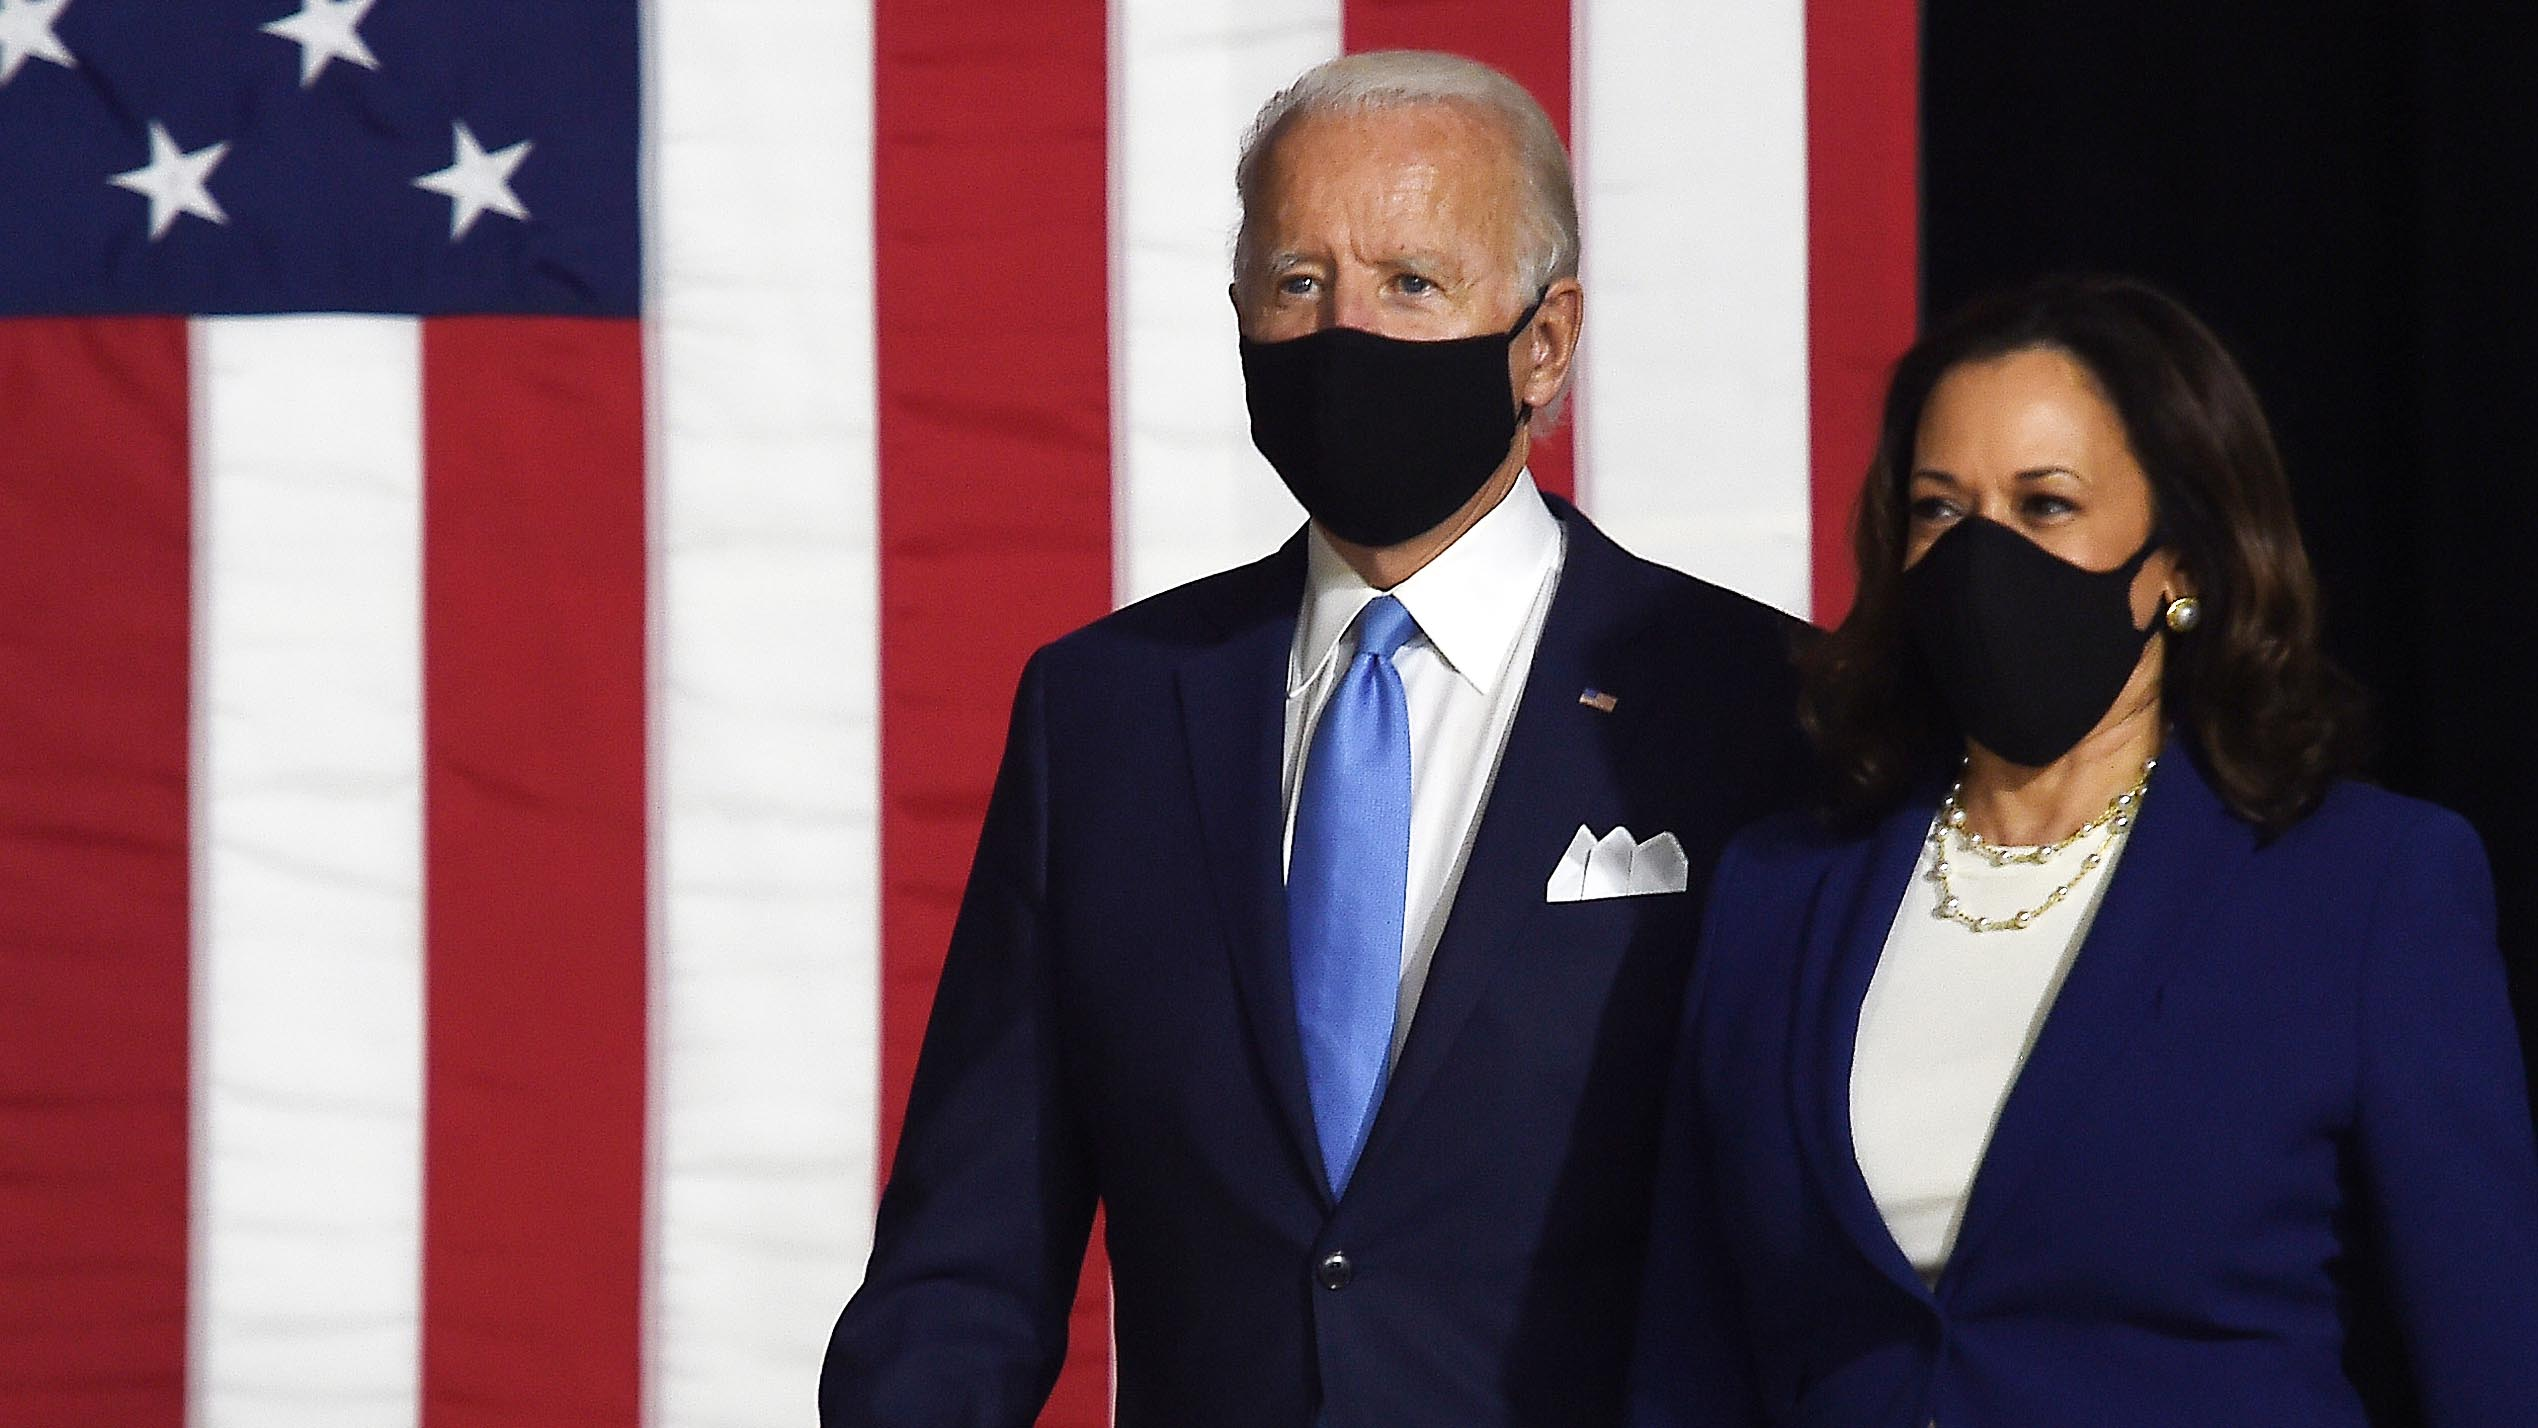 She S Ready To Do This Job On Day 1 Joe Biden Introduces Kamala Harris As Running Mate